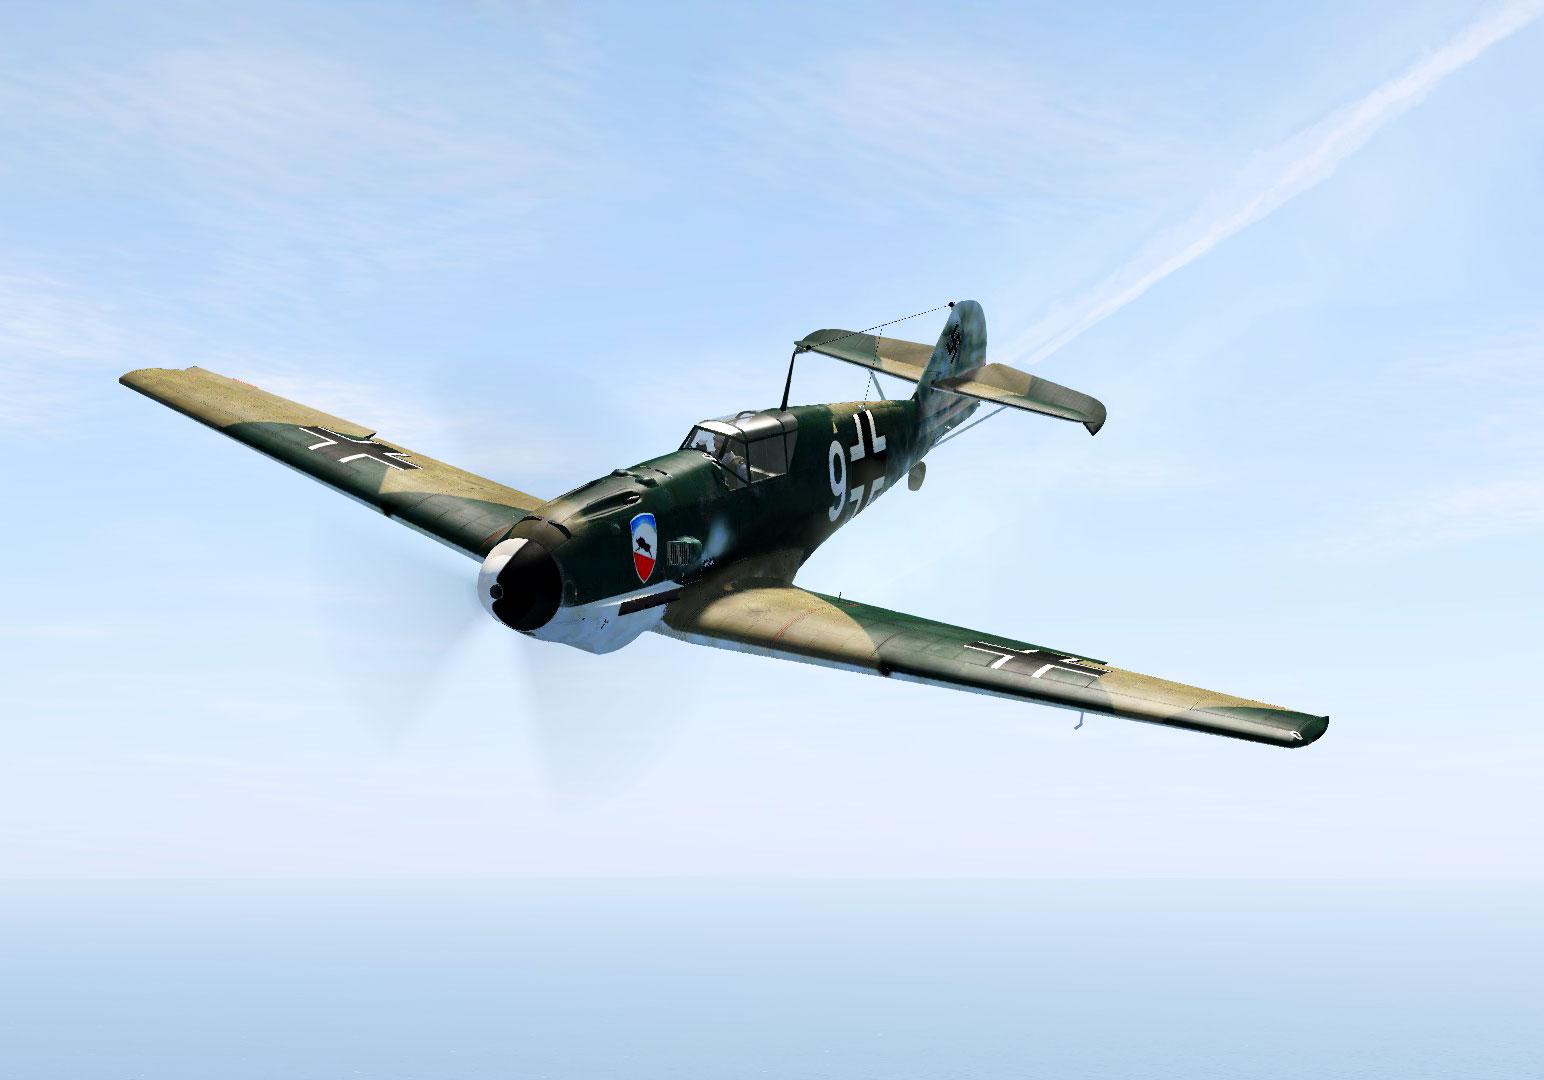 COD OD Bf 109E1 1.JG52 W9 Herbert Bischoff going down 1940 V01